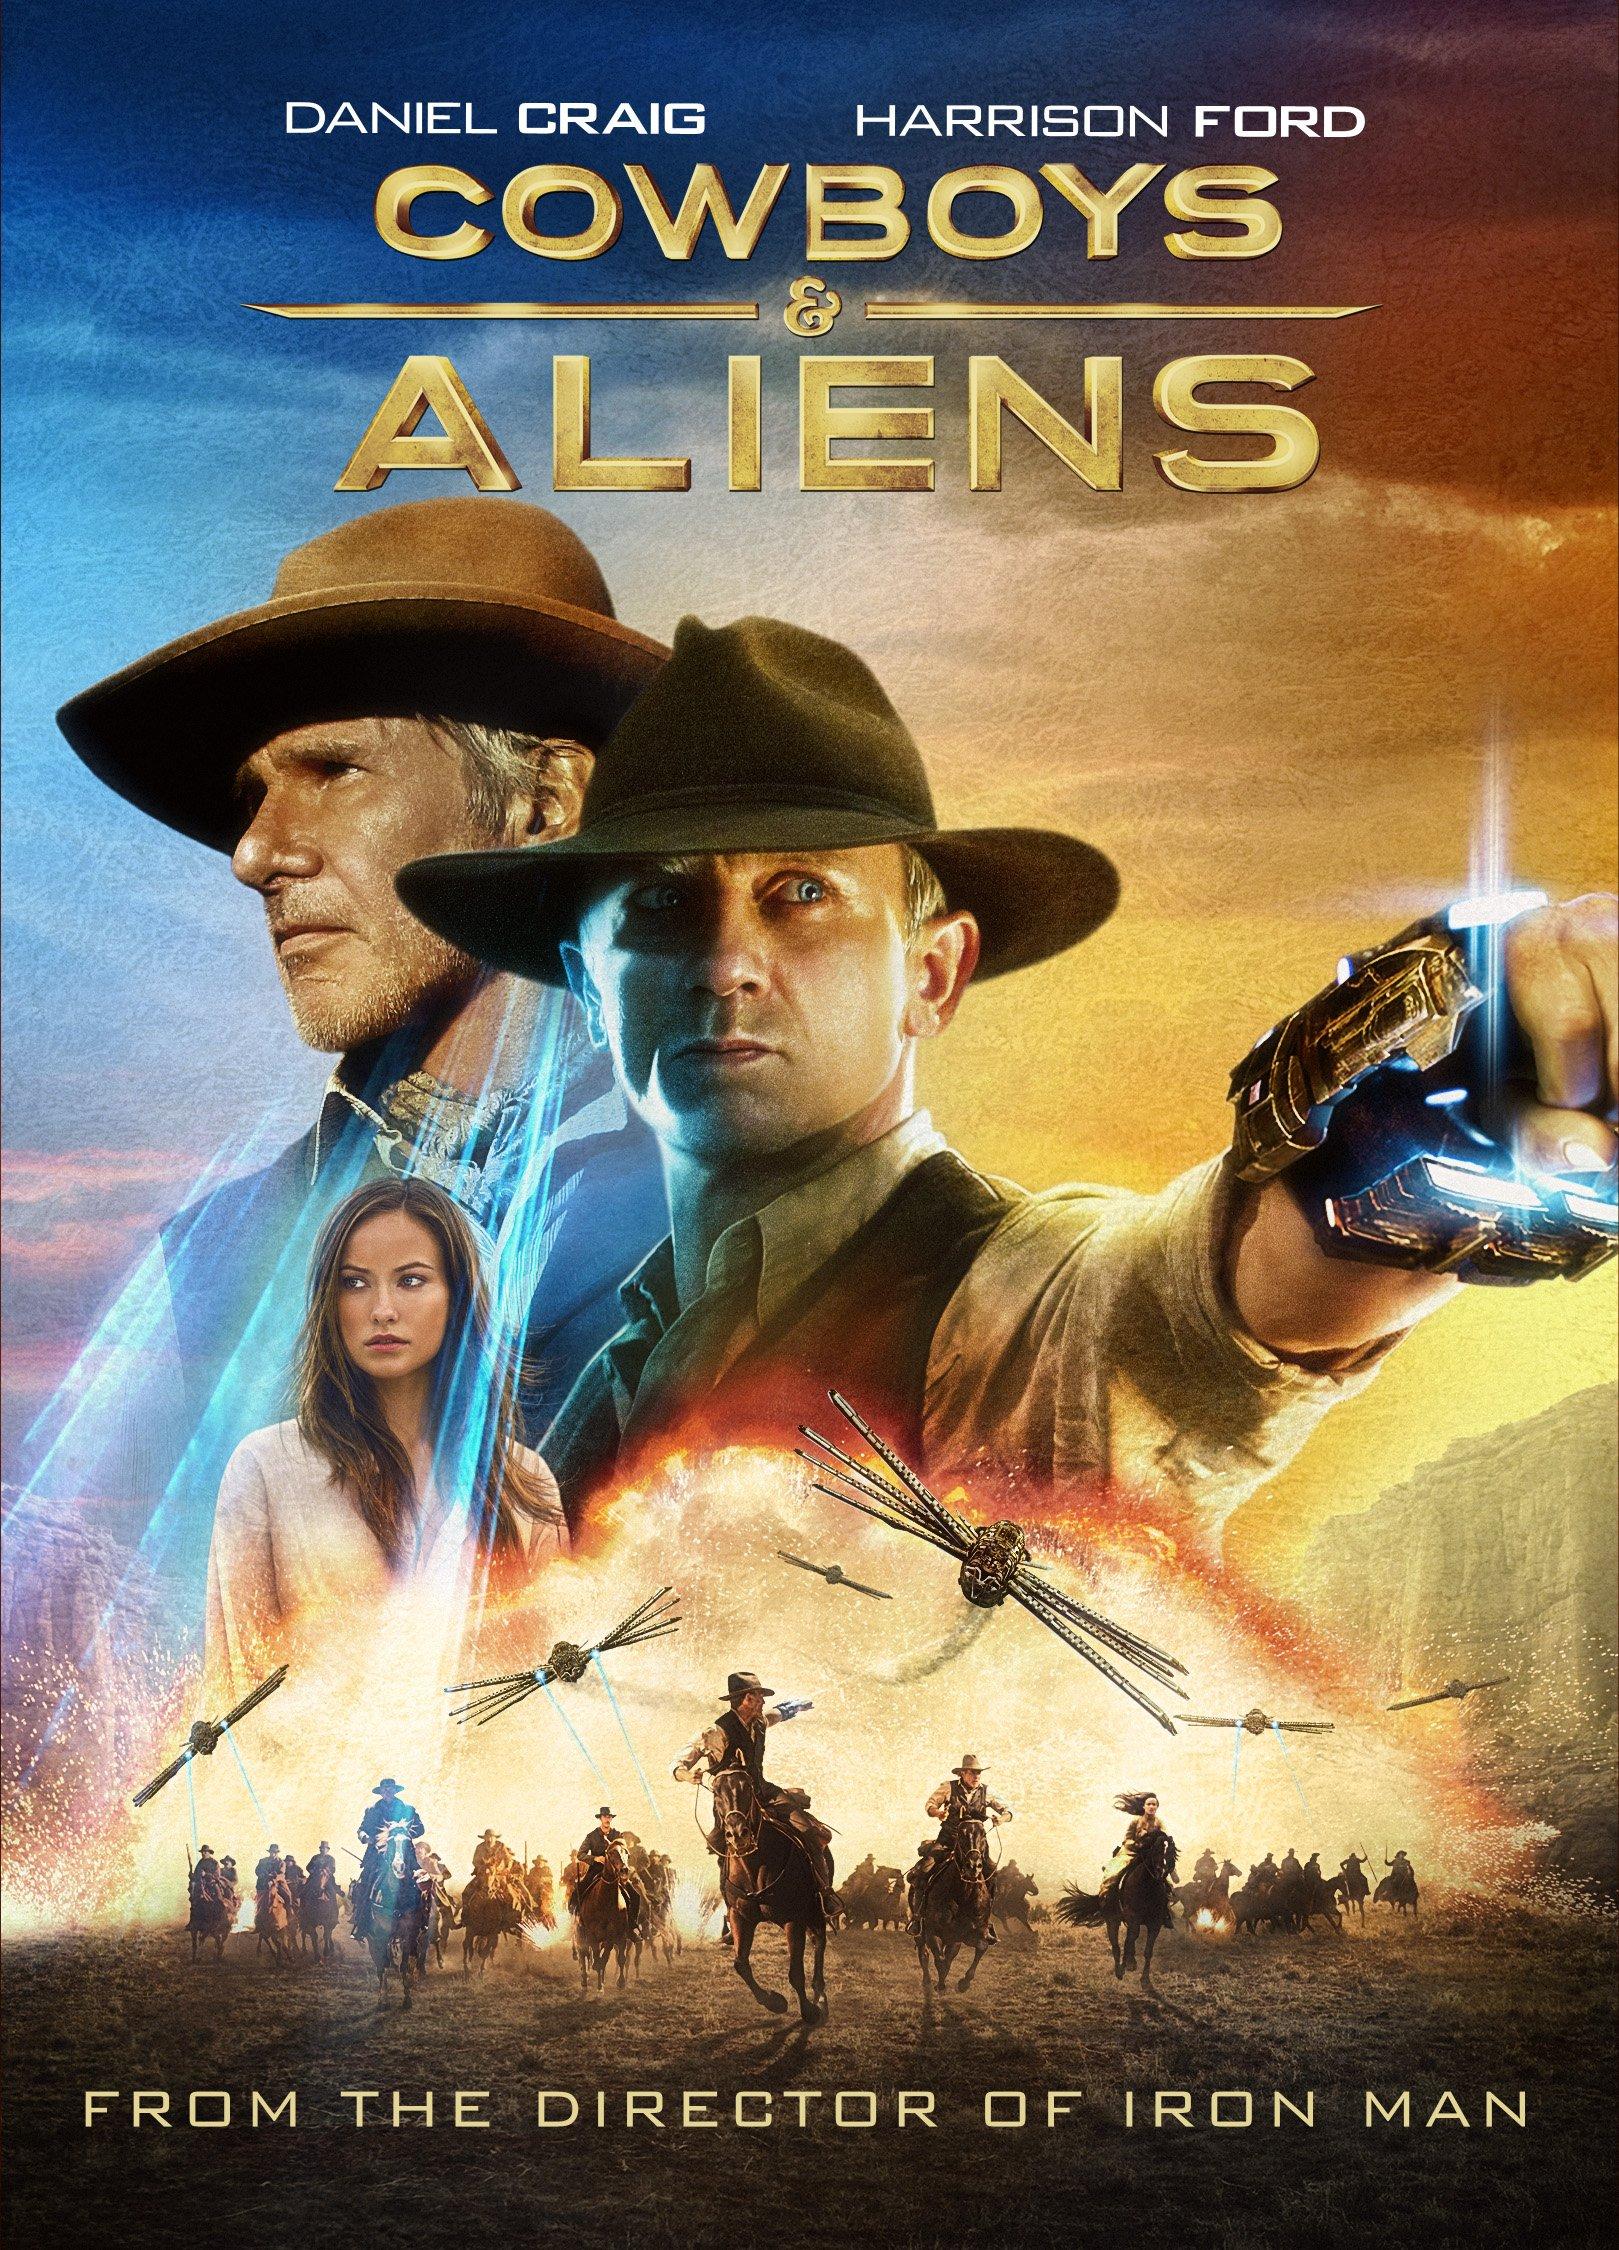 cowboys and aliens.jpg